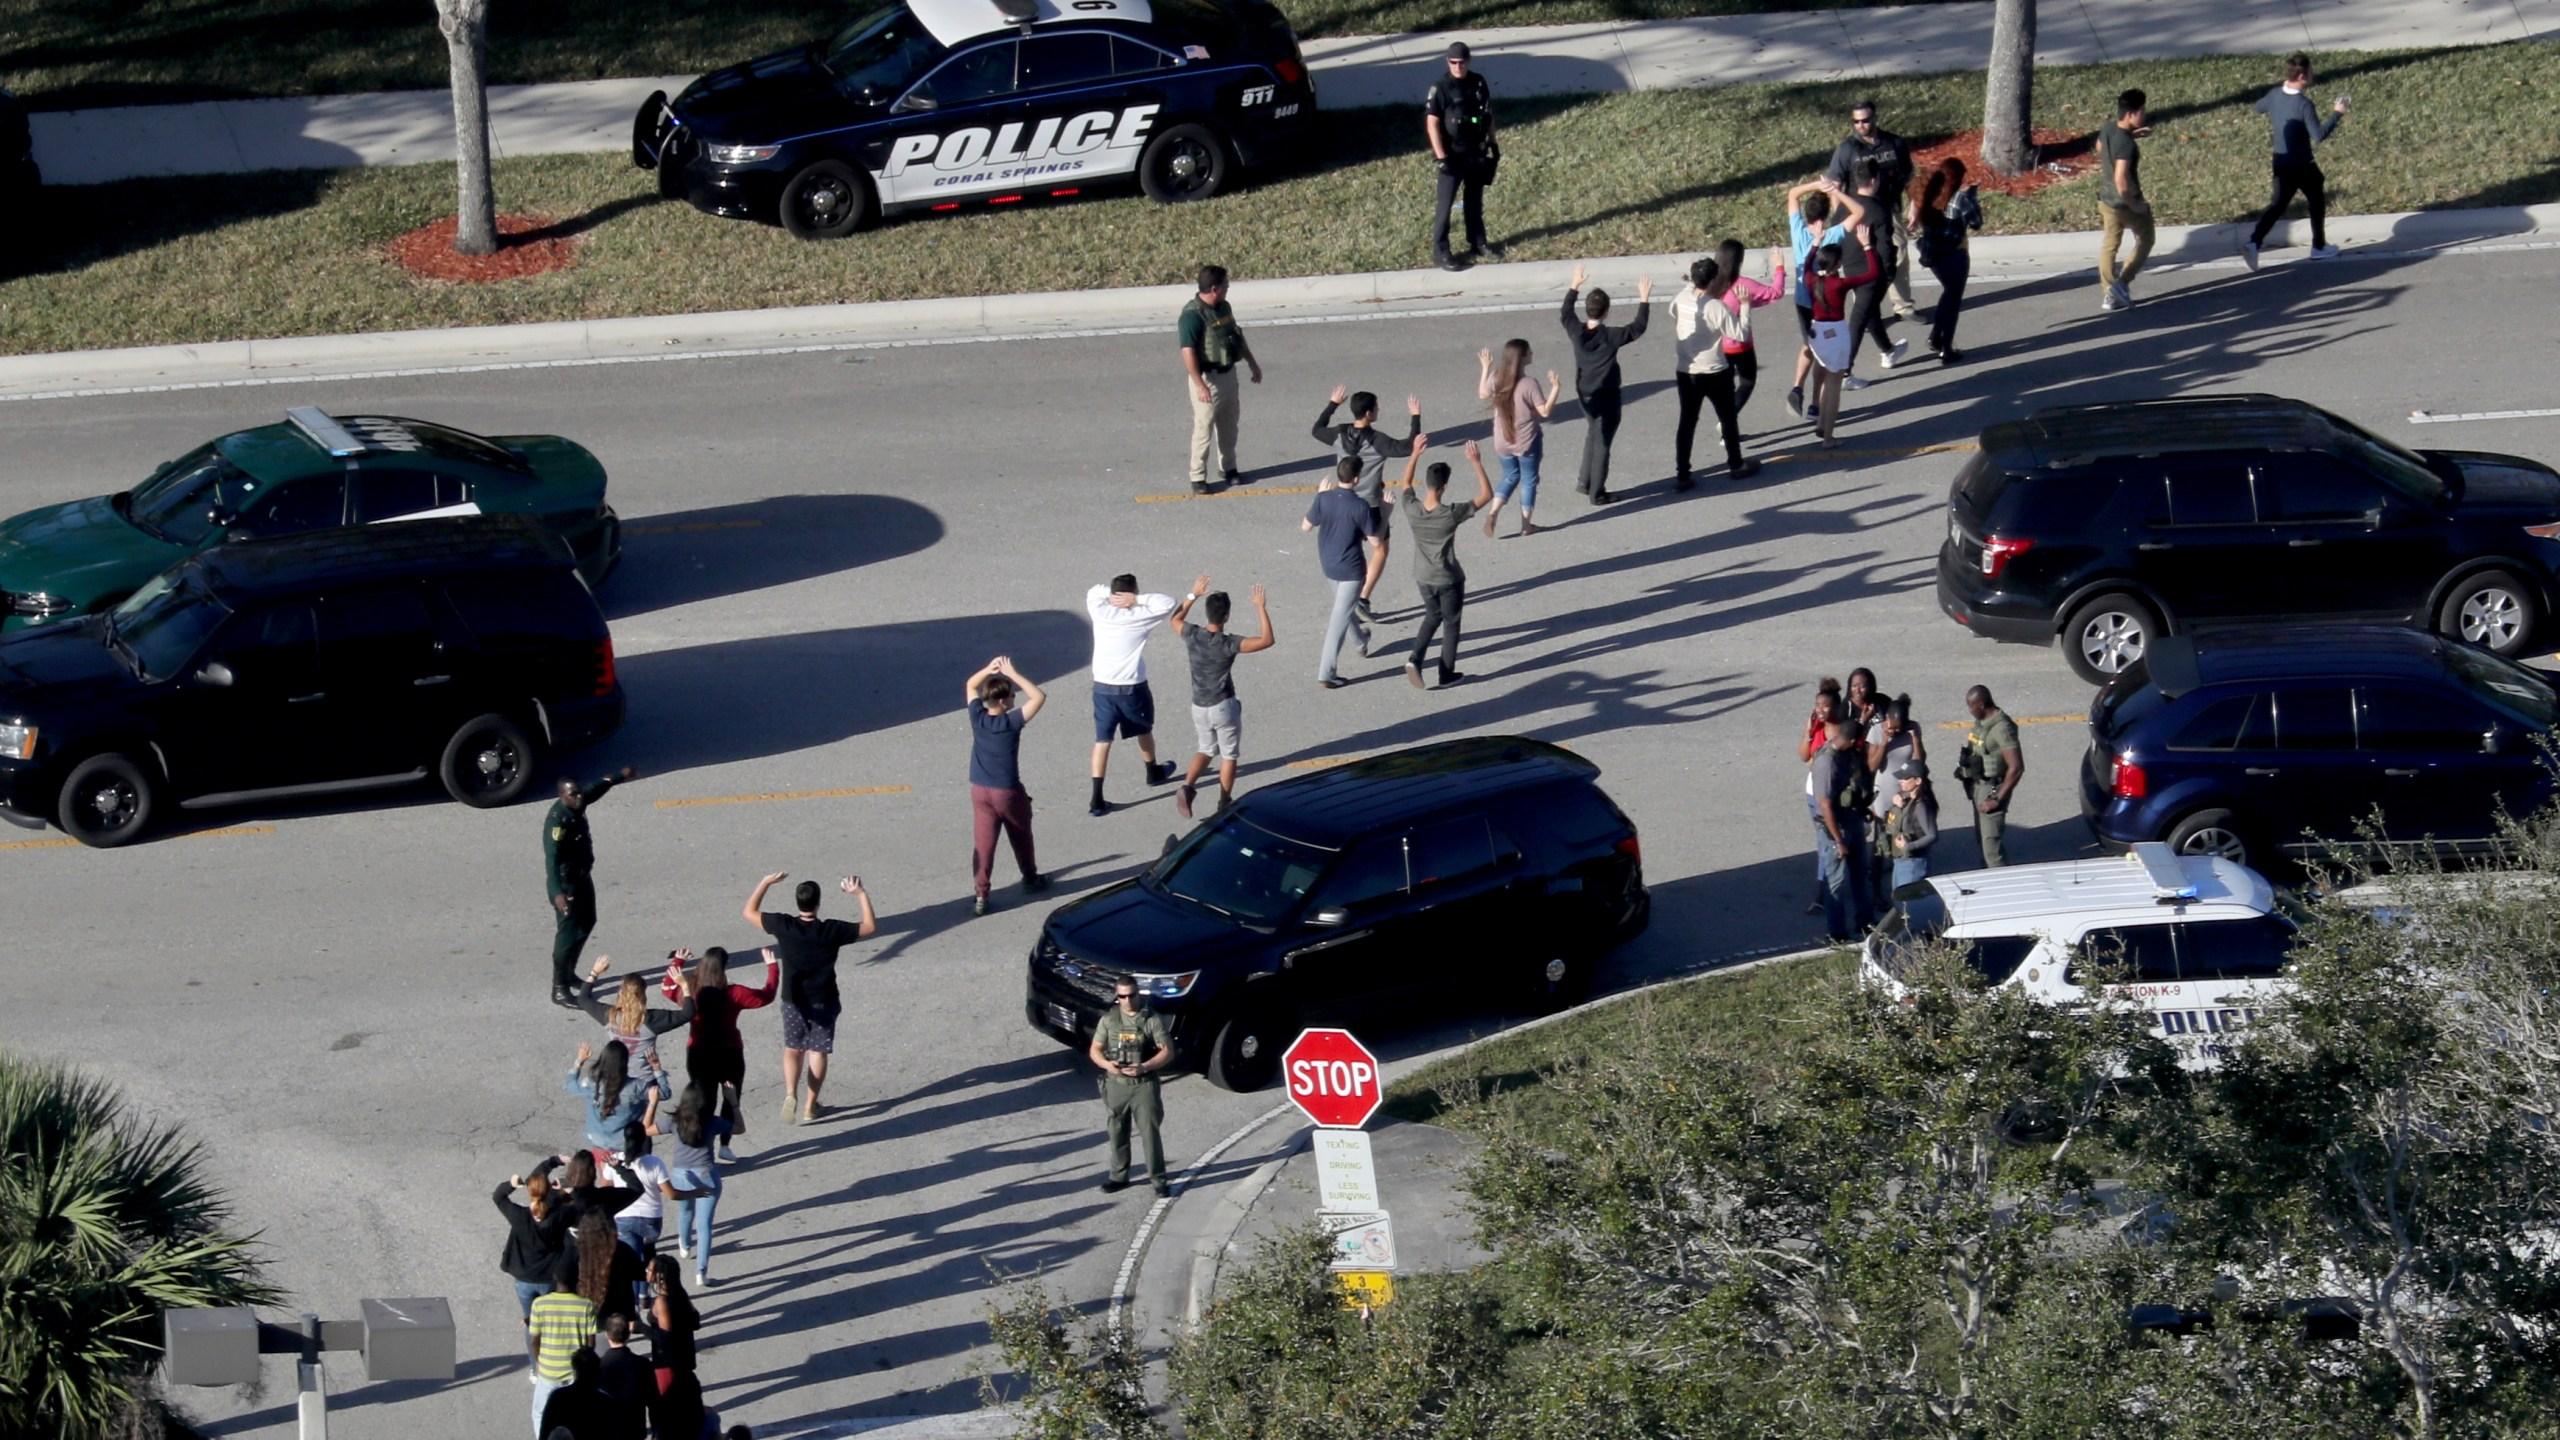 Florida_School_Shooting_911_Calls_05053-159532.jpg27910078